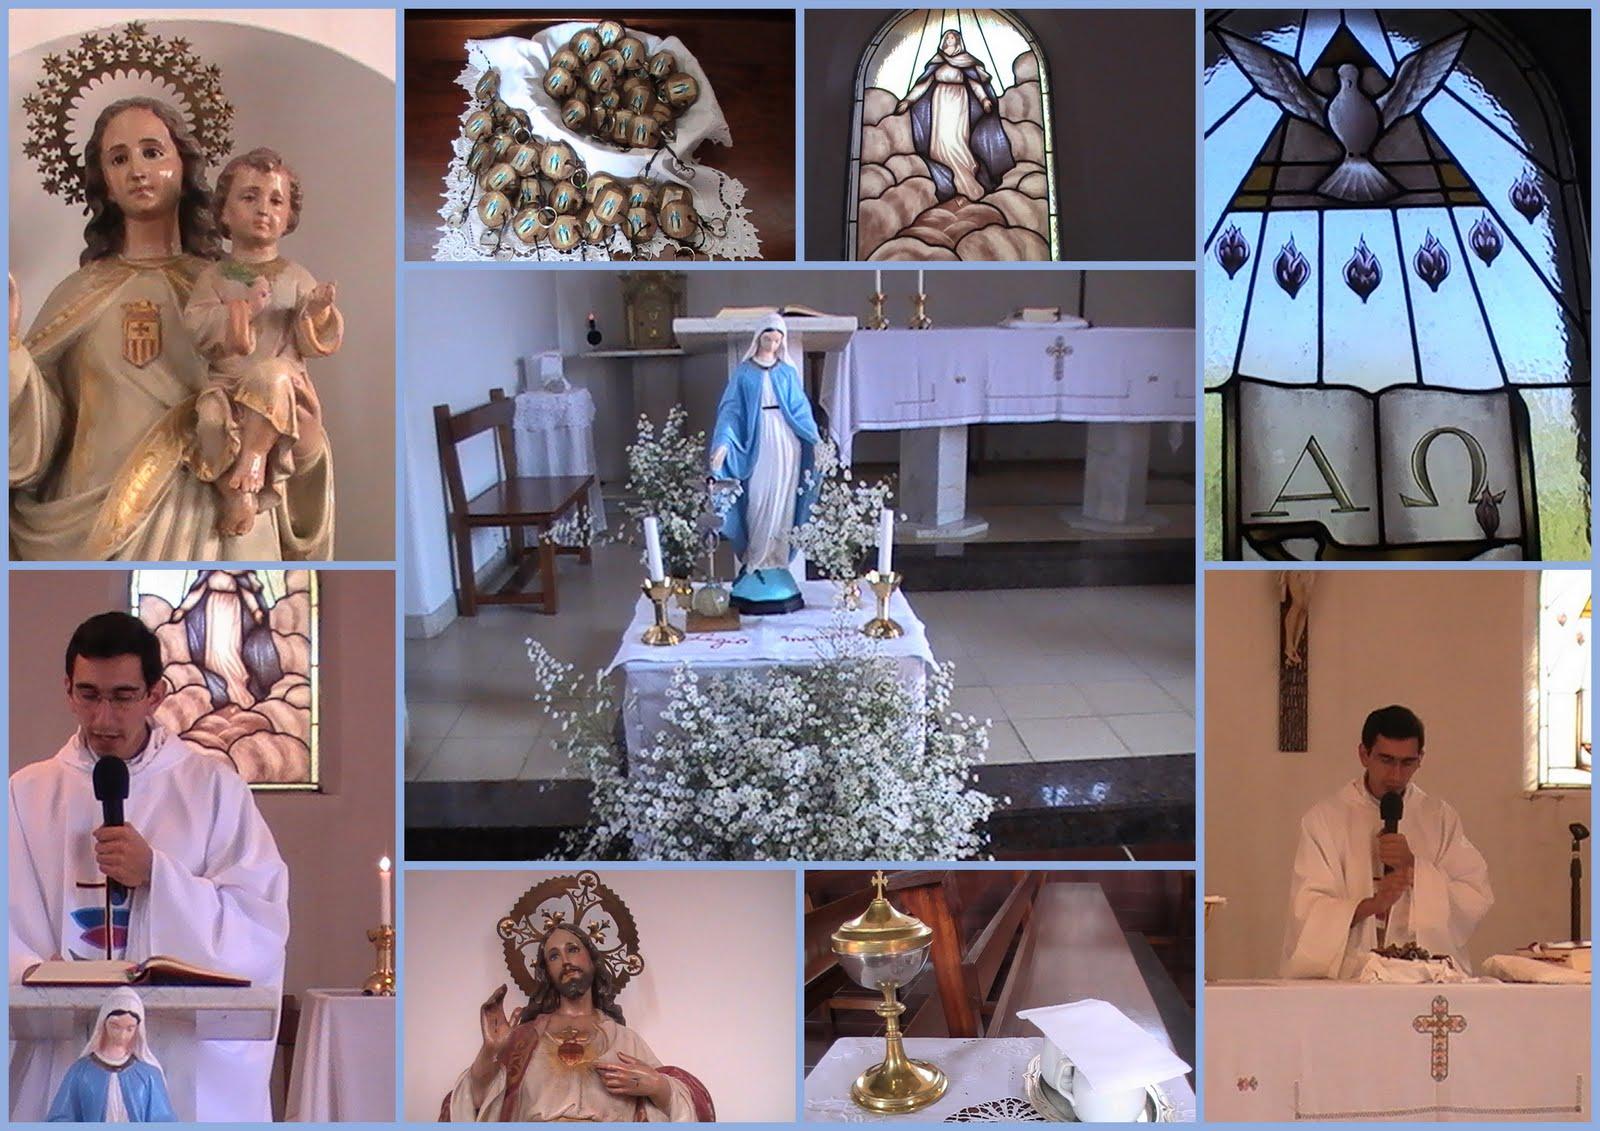 http://4.bp.blogspot.com/_VlU6TsleaNg/S67EVyTgswI/AAAAAAAAA4c/c_QUeX4qr5Y/s1600/Fiesta+del+Acies.jpg